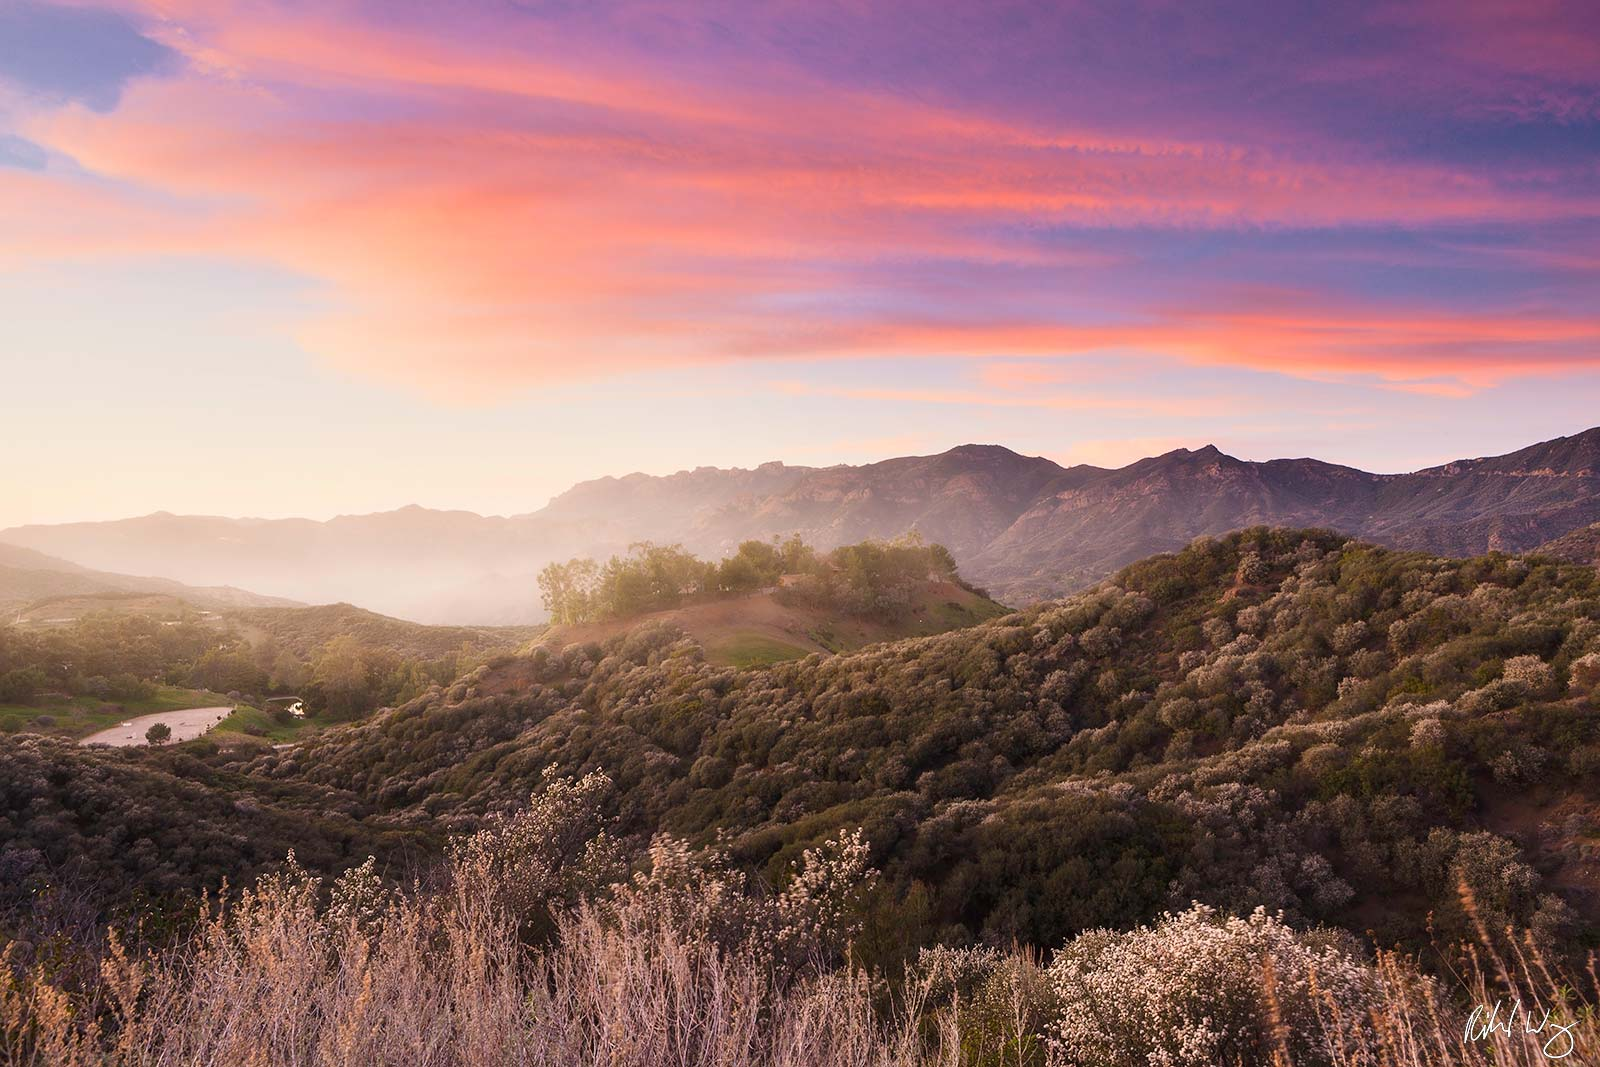 Sunset, Santa Monica Mountains National Recreation Area, California, photo